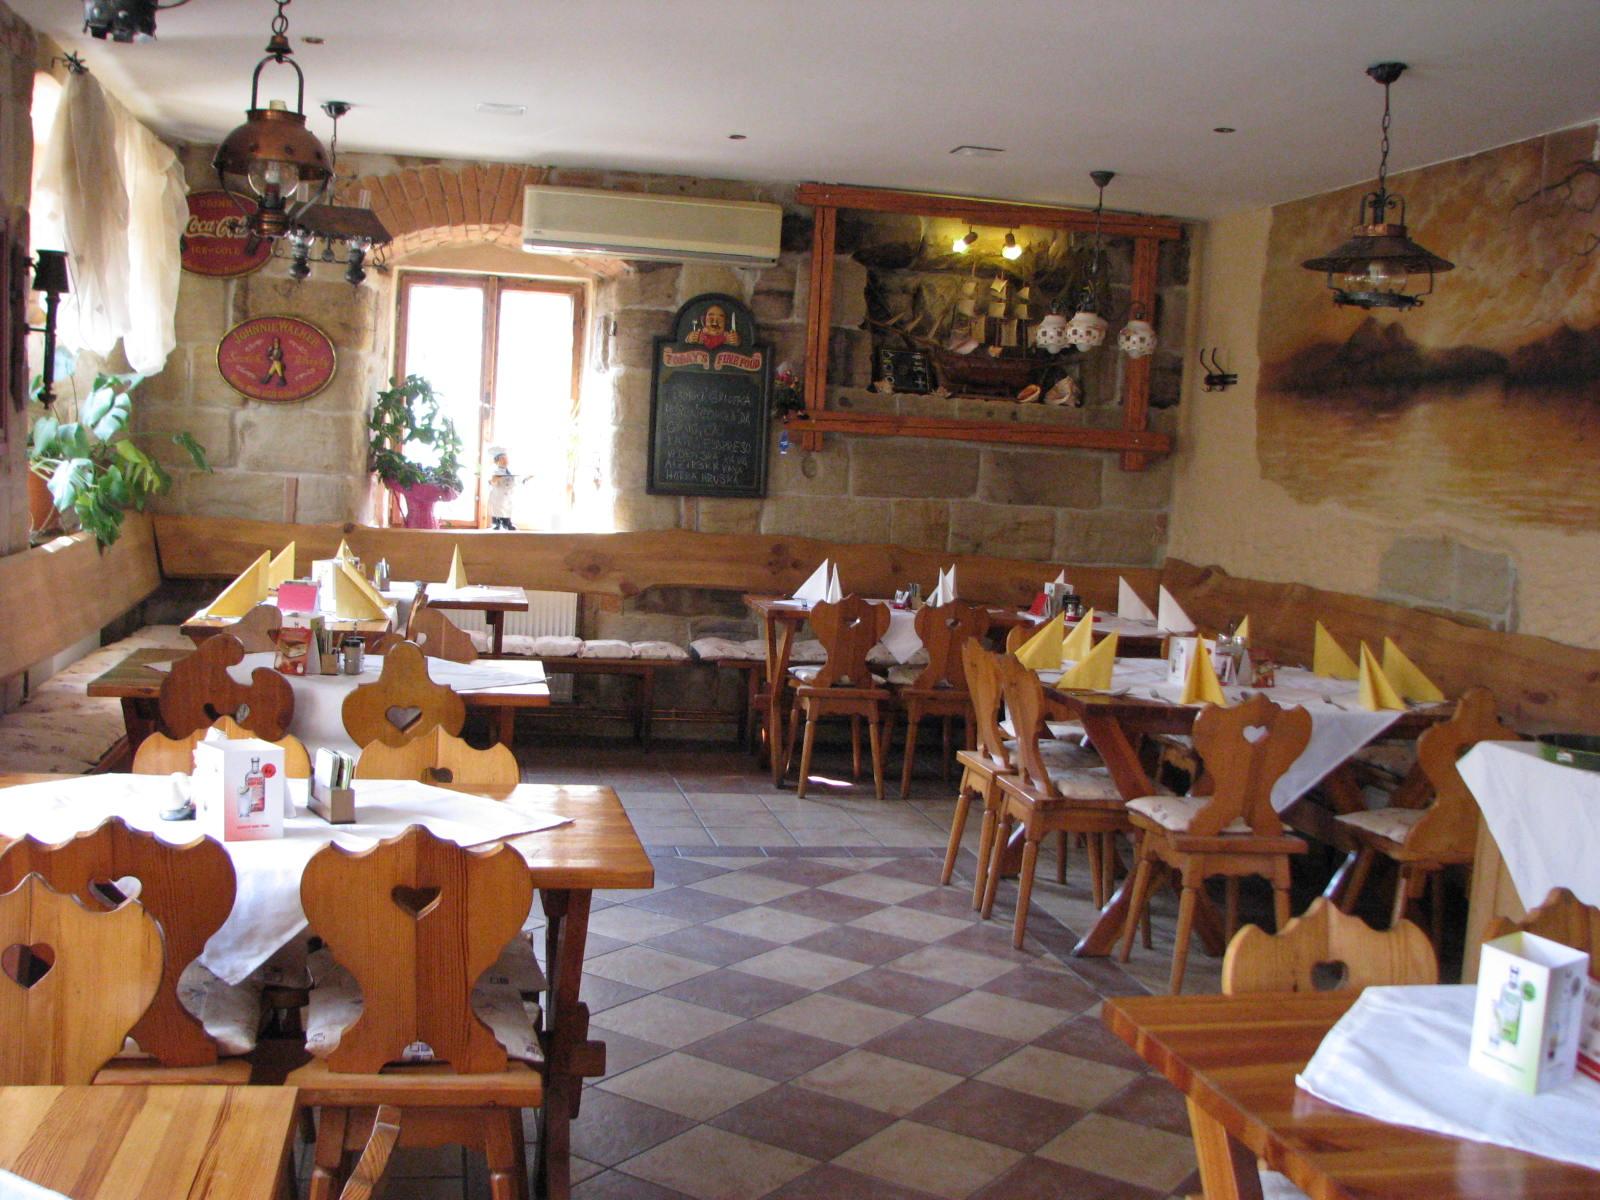 Penzion U Duba - Restaurace Sklípek, u Máchova jezera, Liberecký kraj